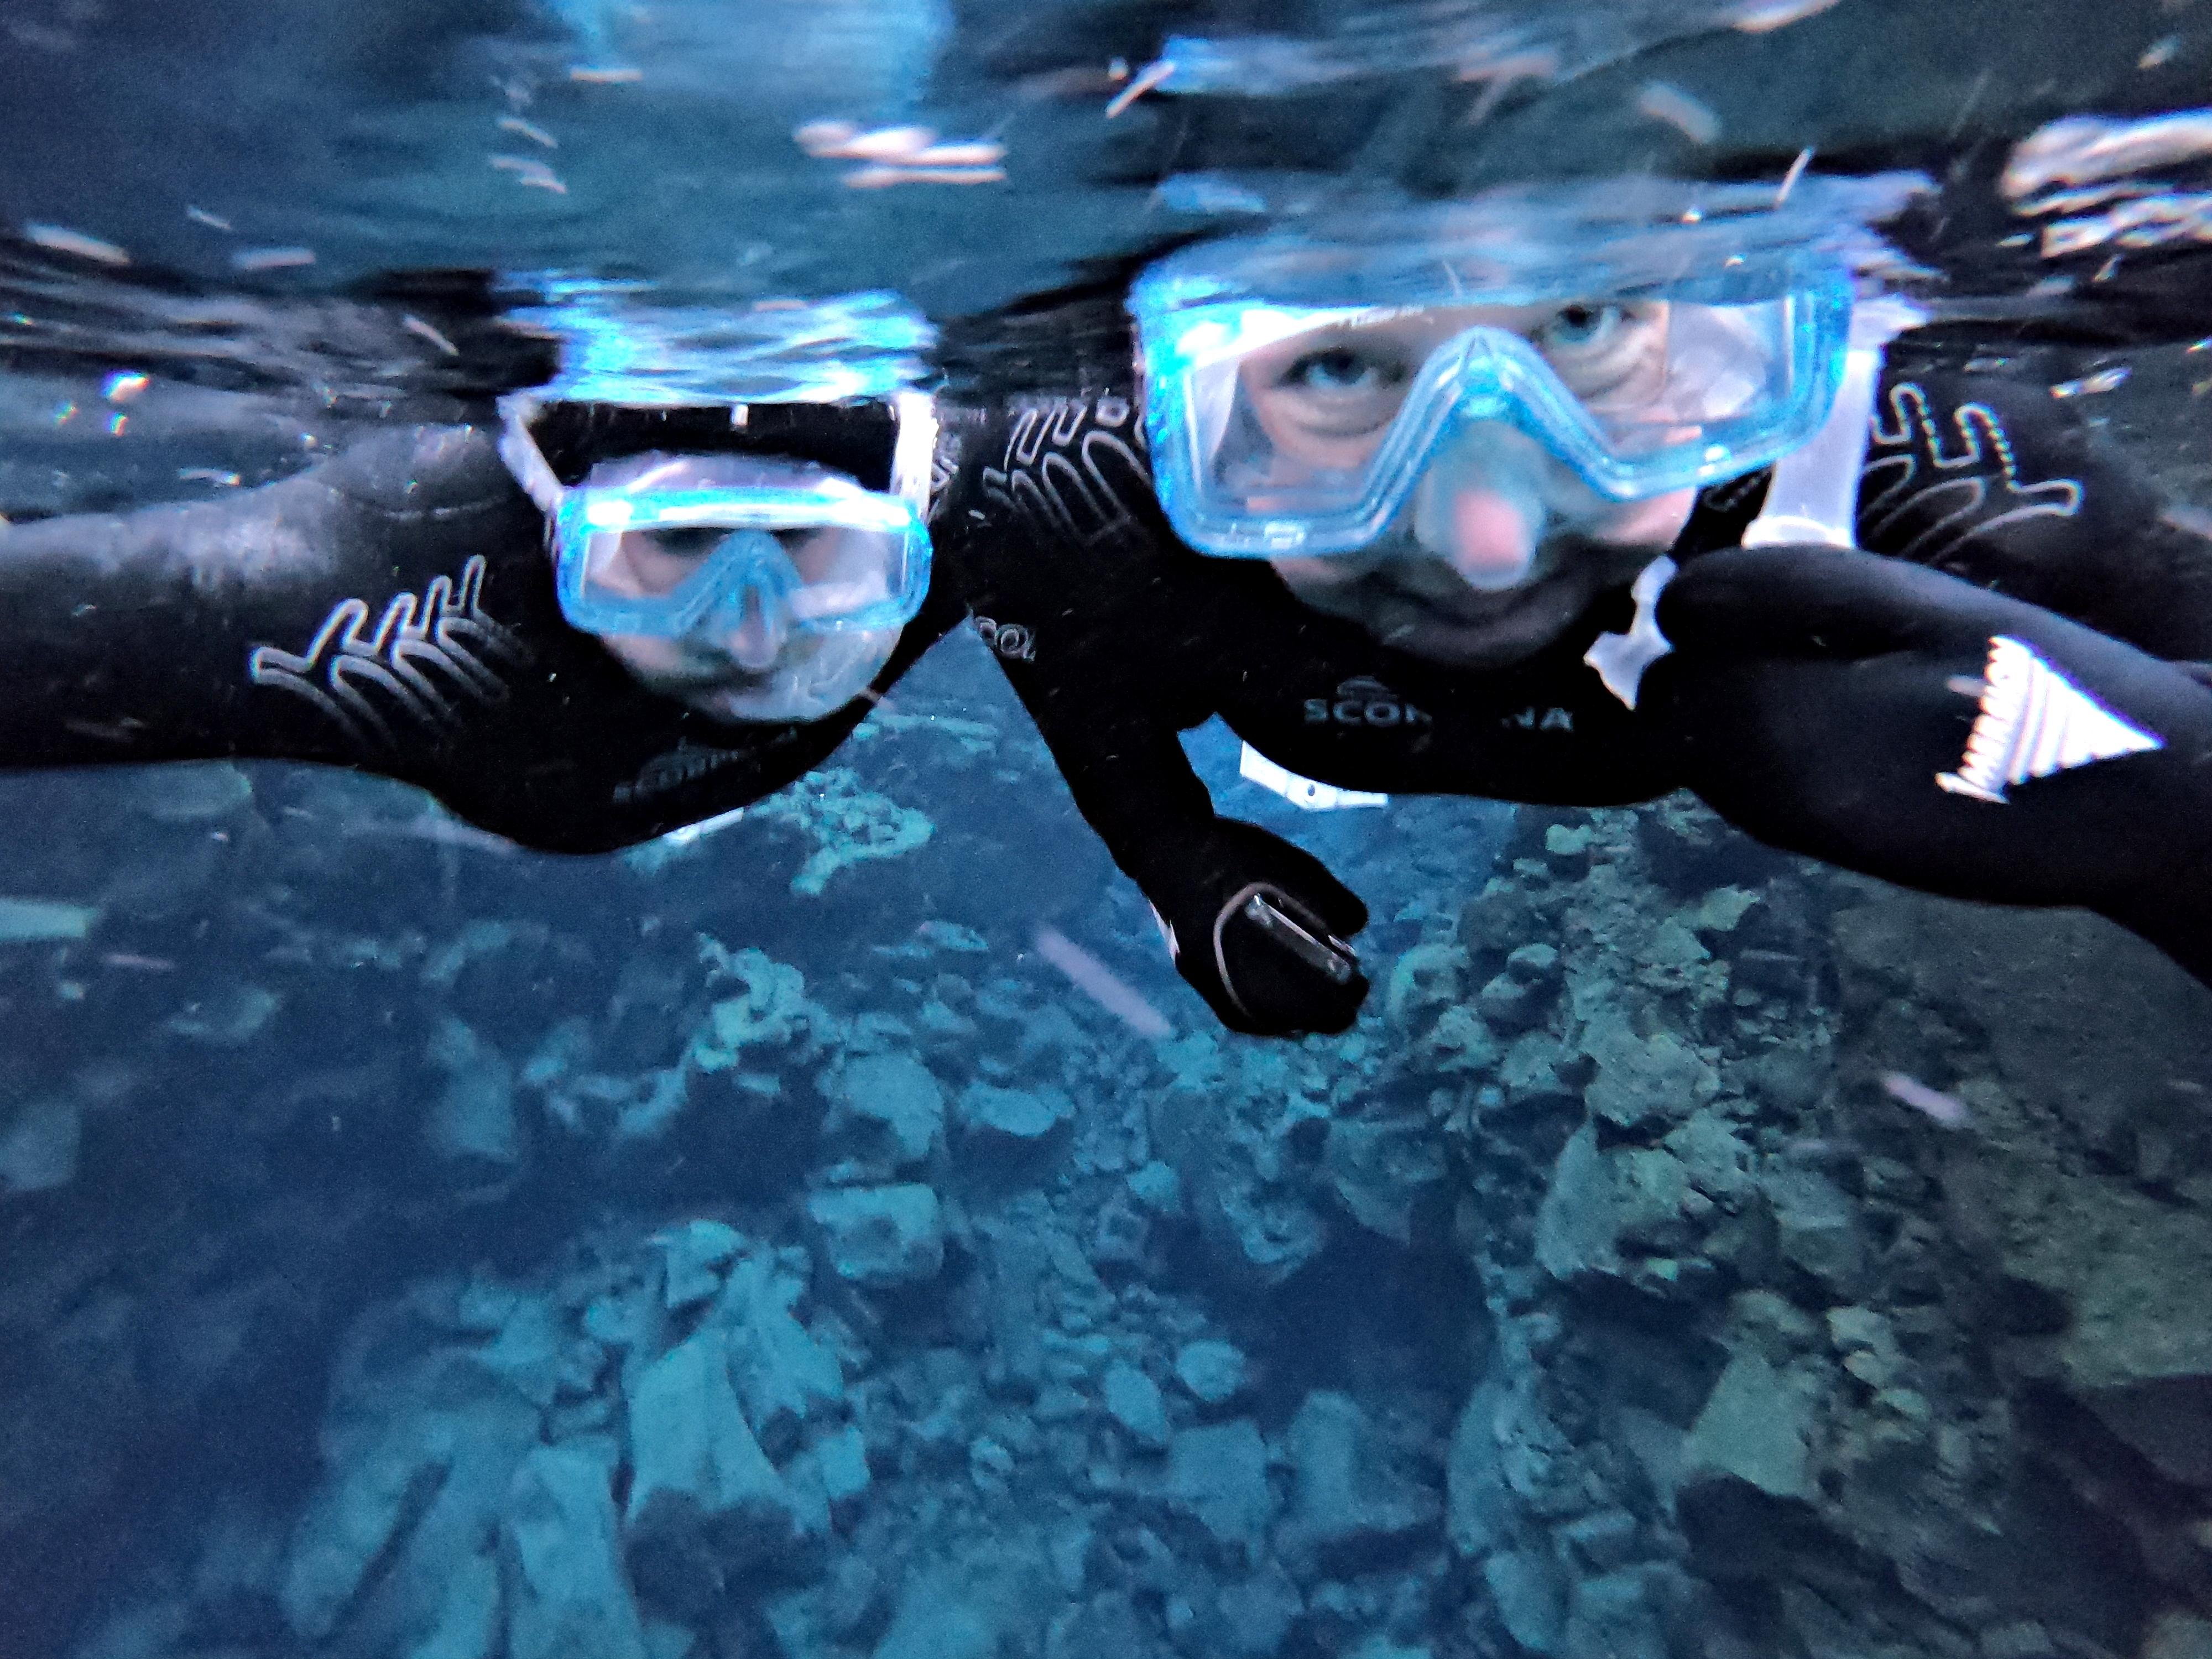 Adventure At Nature Neoprene 3 Mm Socks For Scuba Diving Water Sport Freediving Sporting Goods Fins, Footwear & Gloves